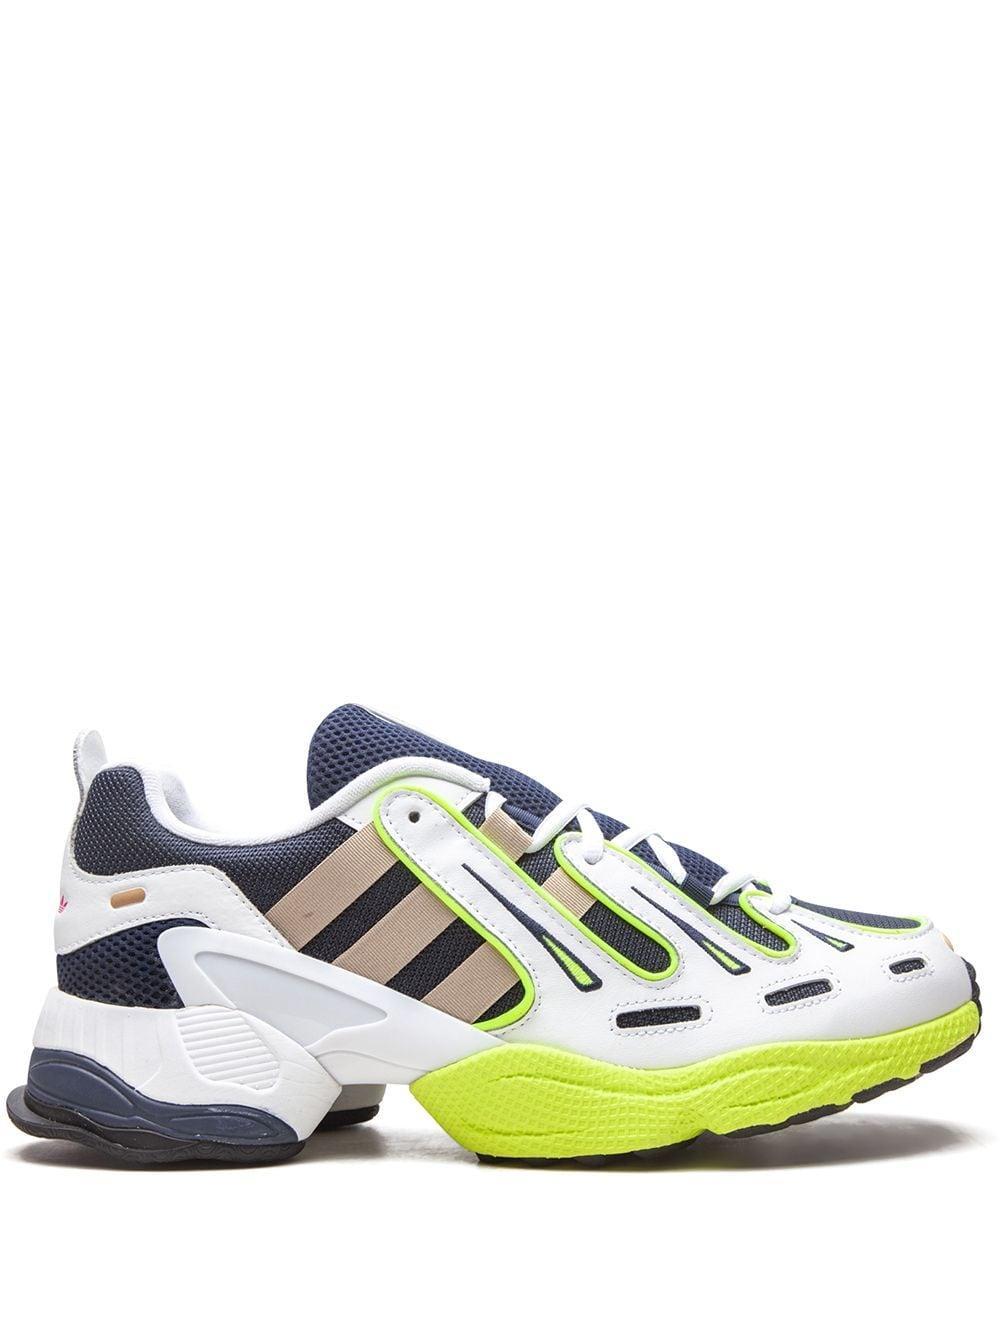 Eqt Gazelle Low-top Sneakers